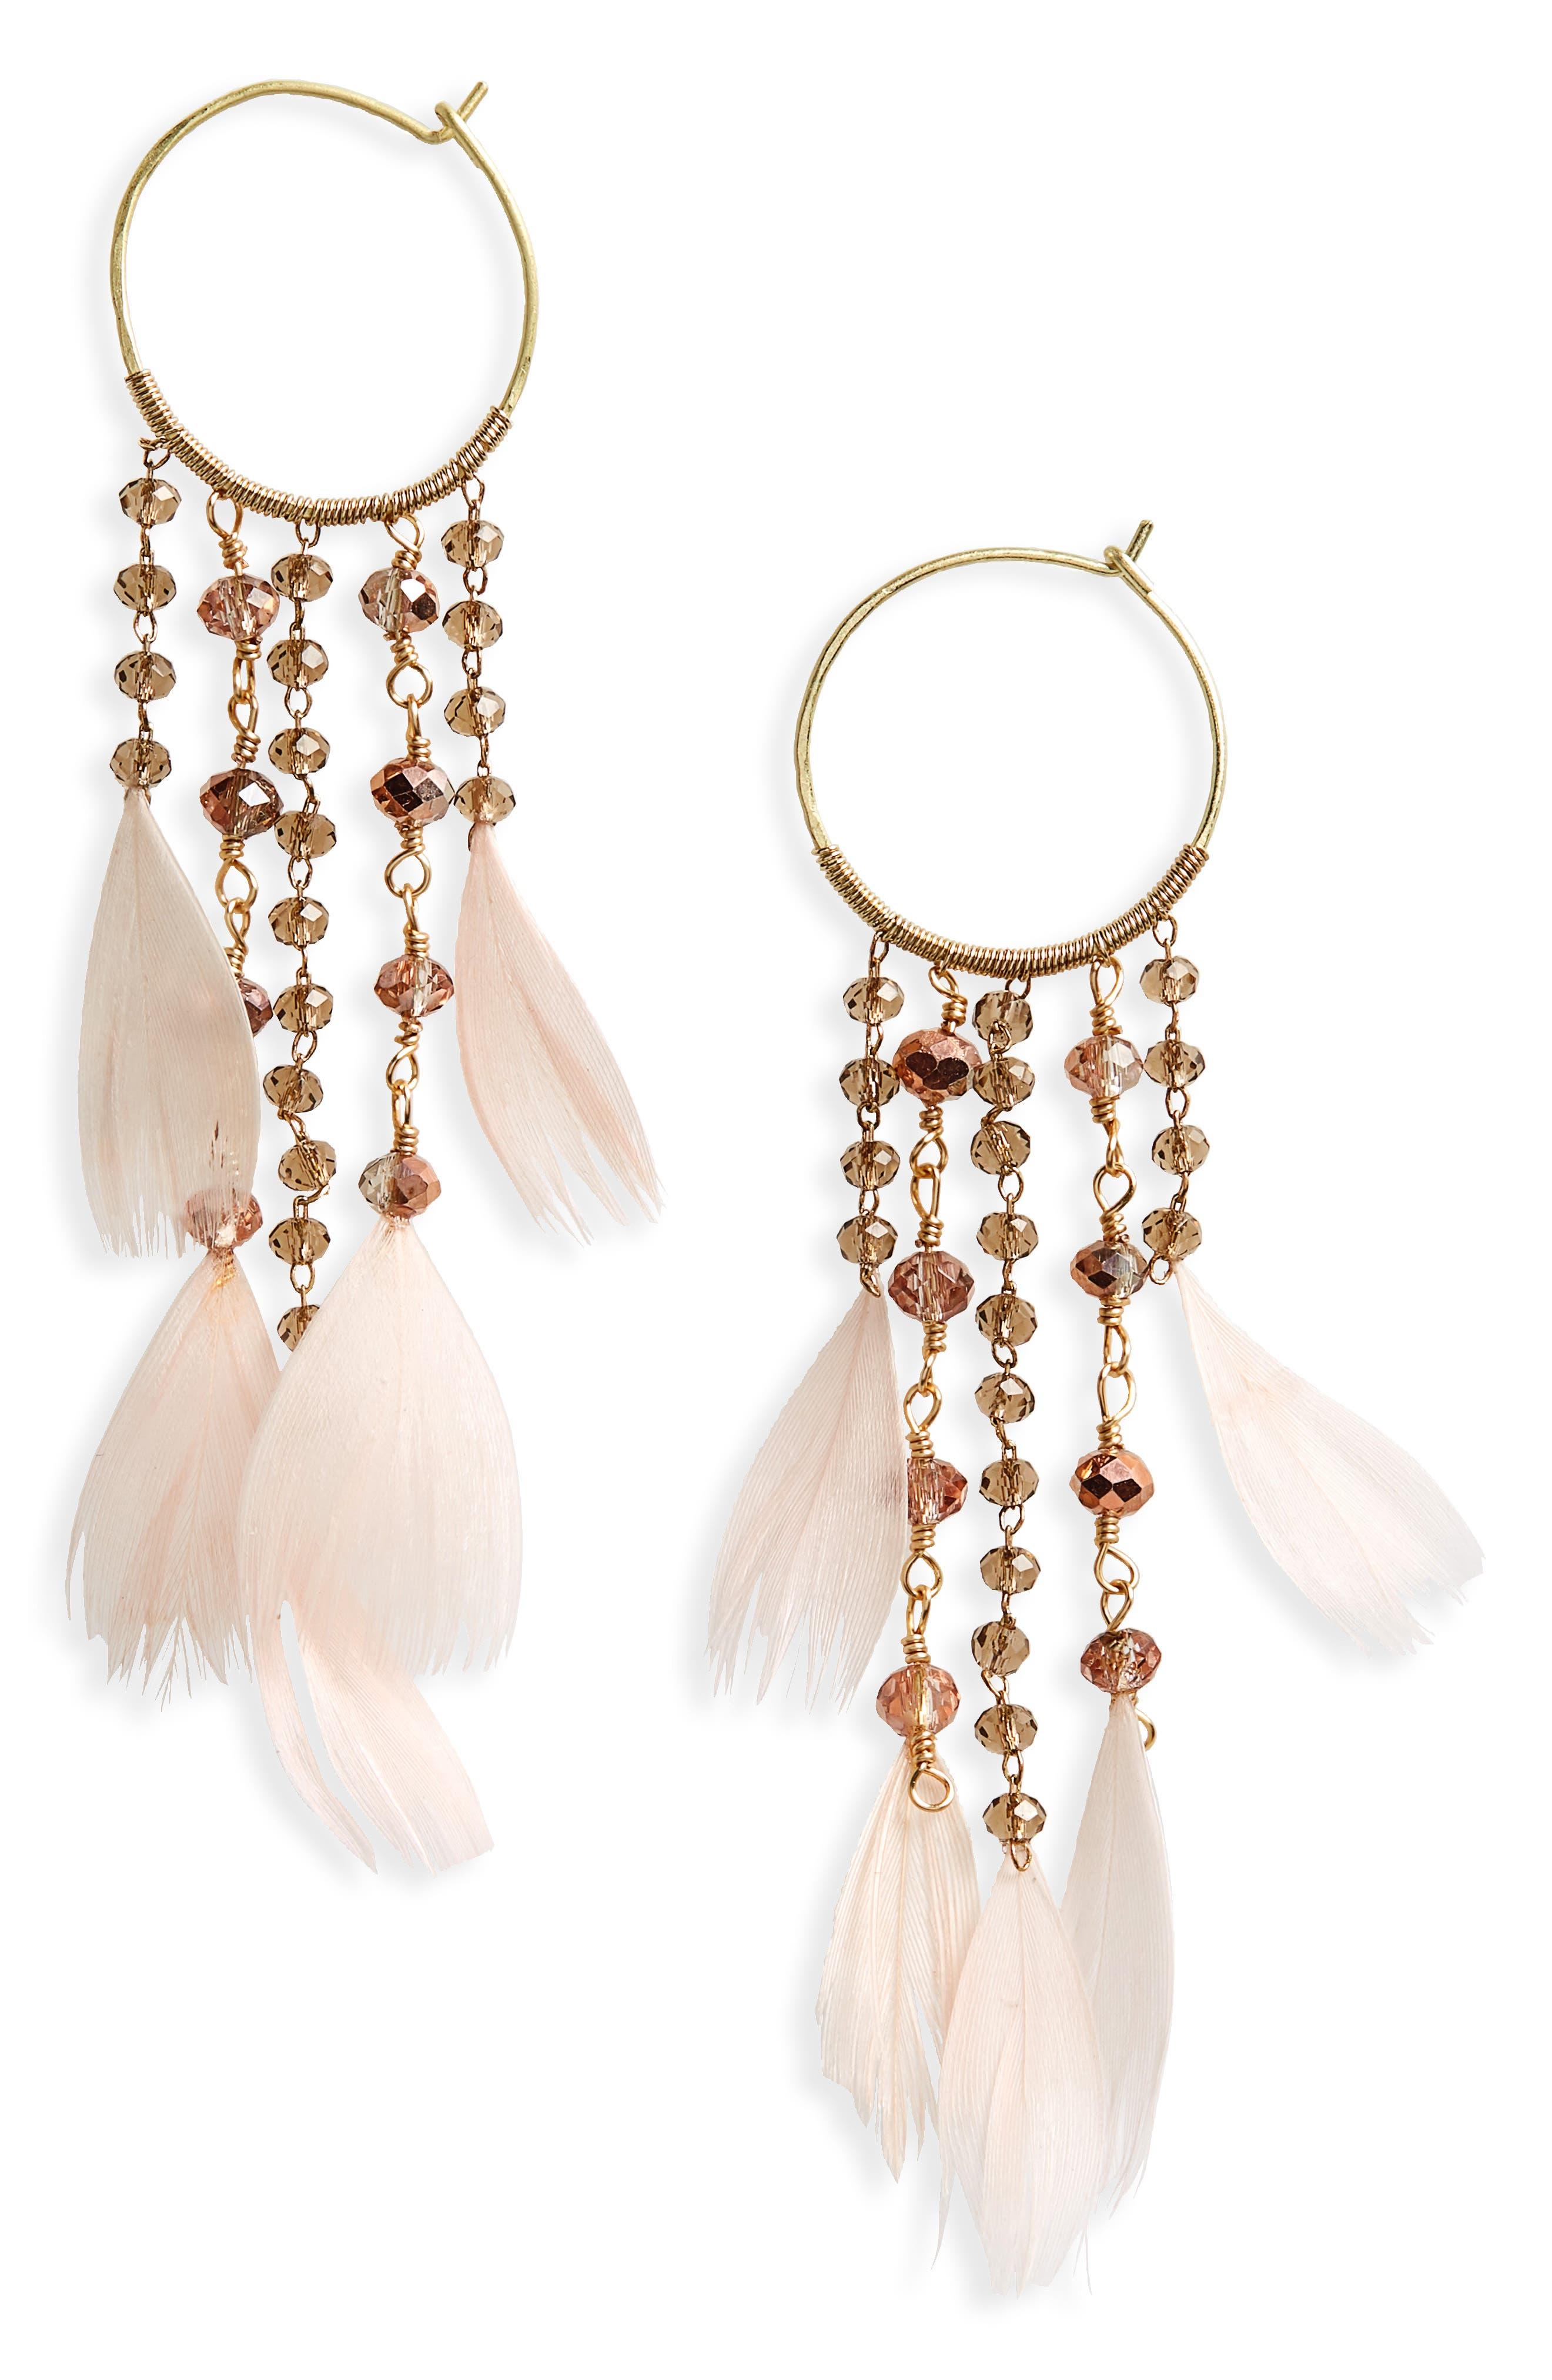 Cascading Crystal & Feather Hoop Earrings,                             Main thumbnail 1, color,                             Blush